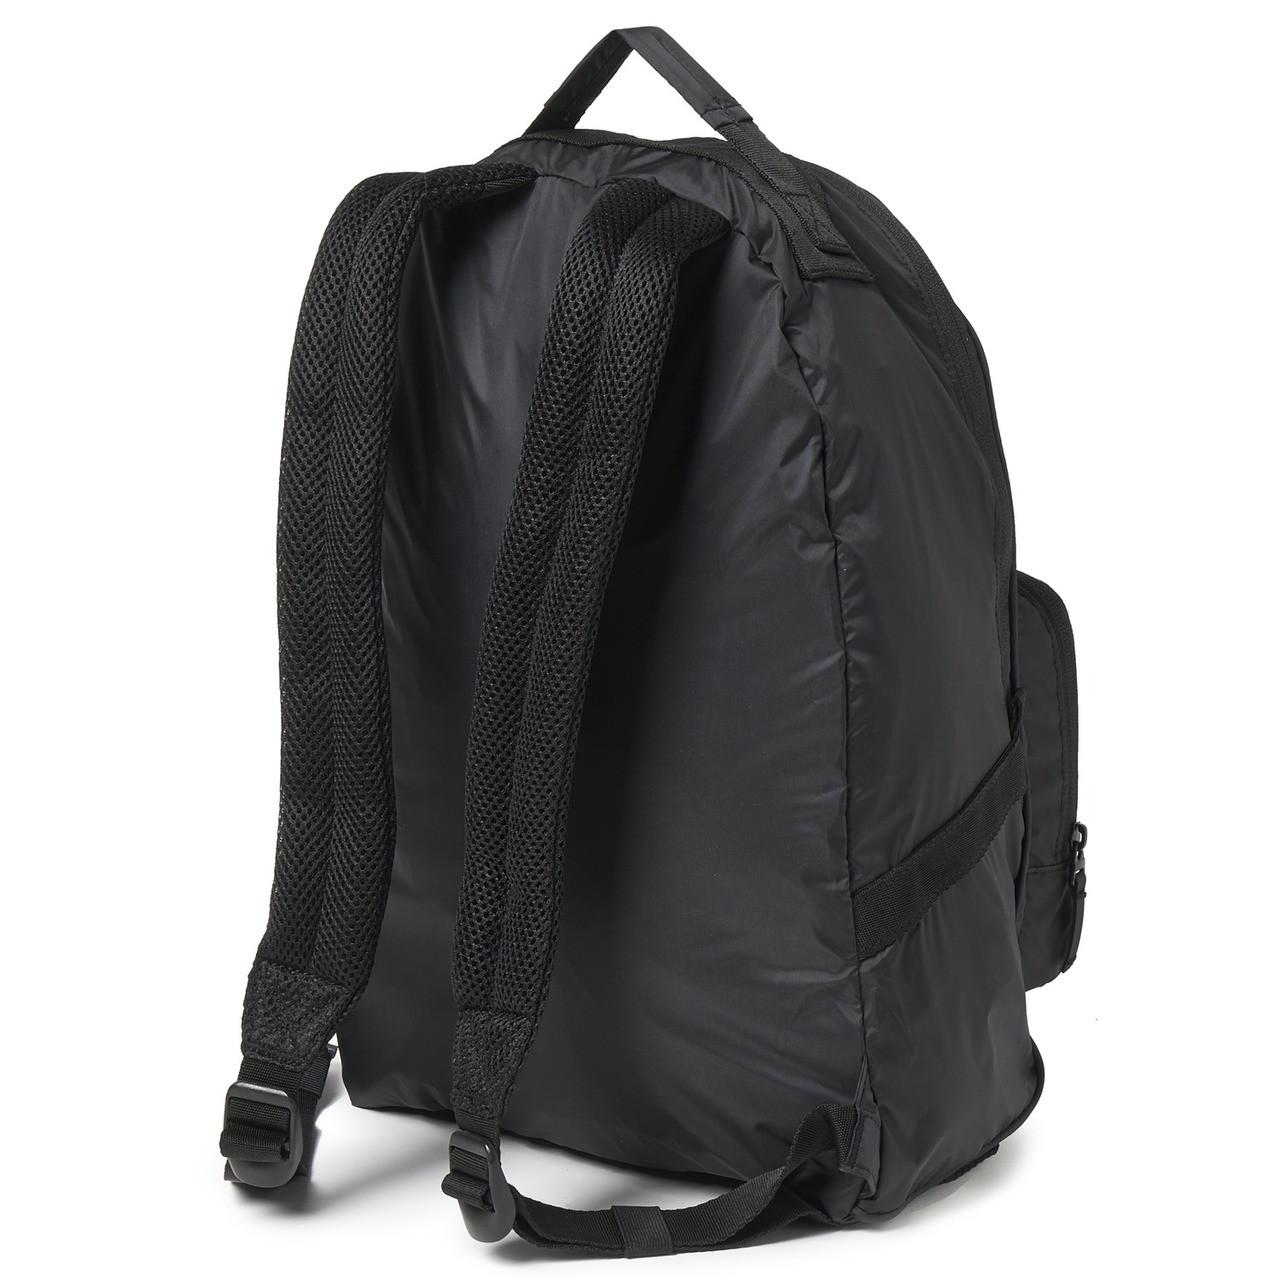 921424ODM Oakley Packable Backpack | T-shirt.ca